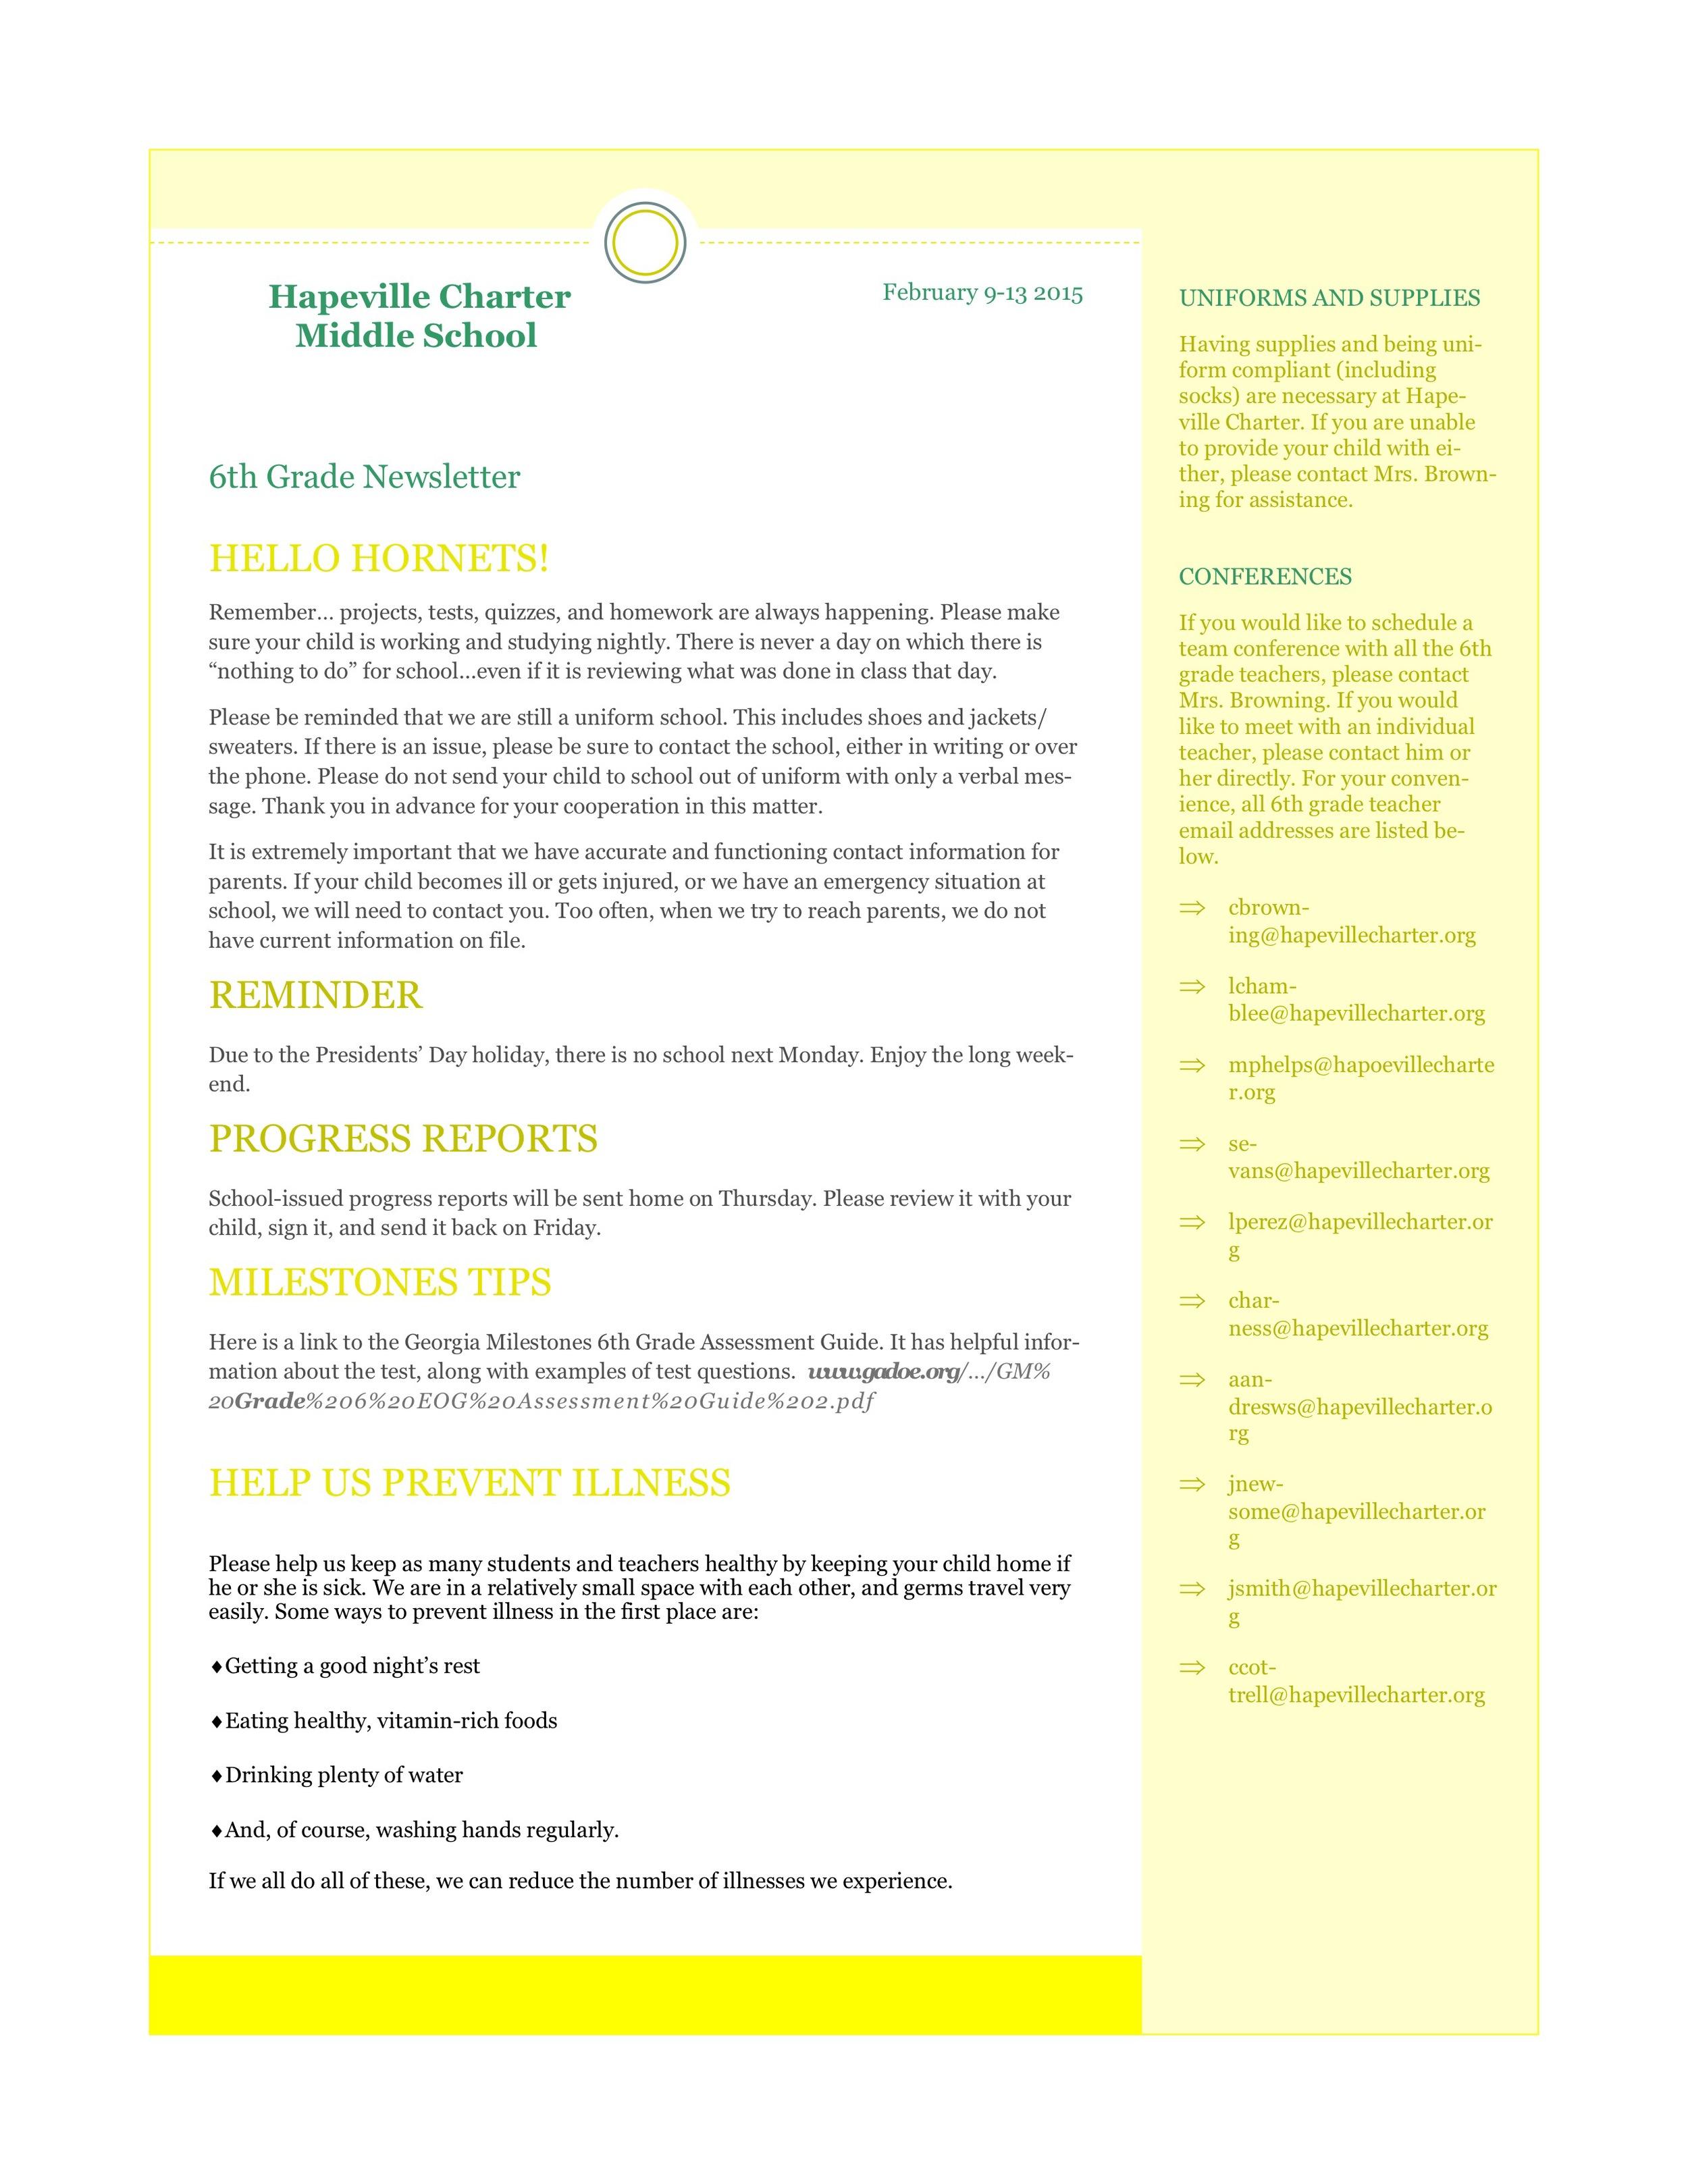 Newsletter ImageFebruary 9-13.jpeg